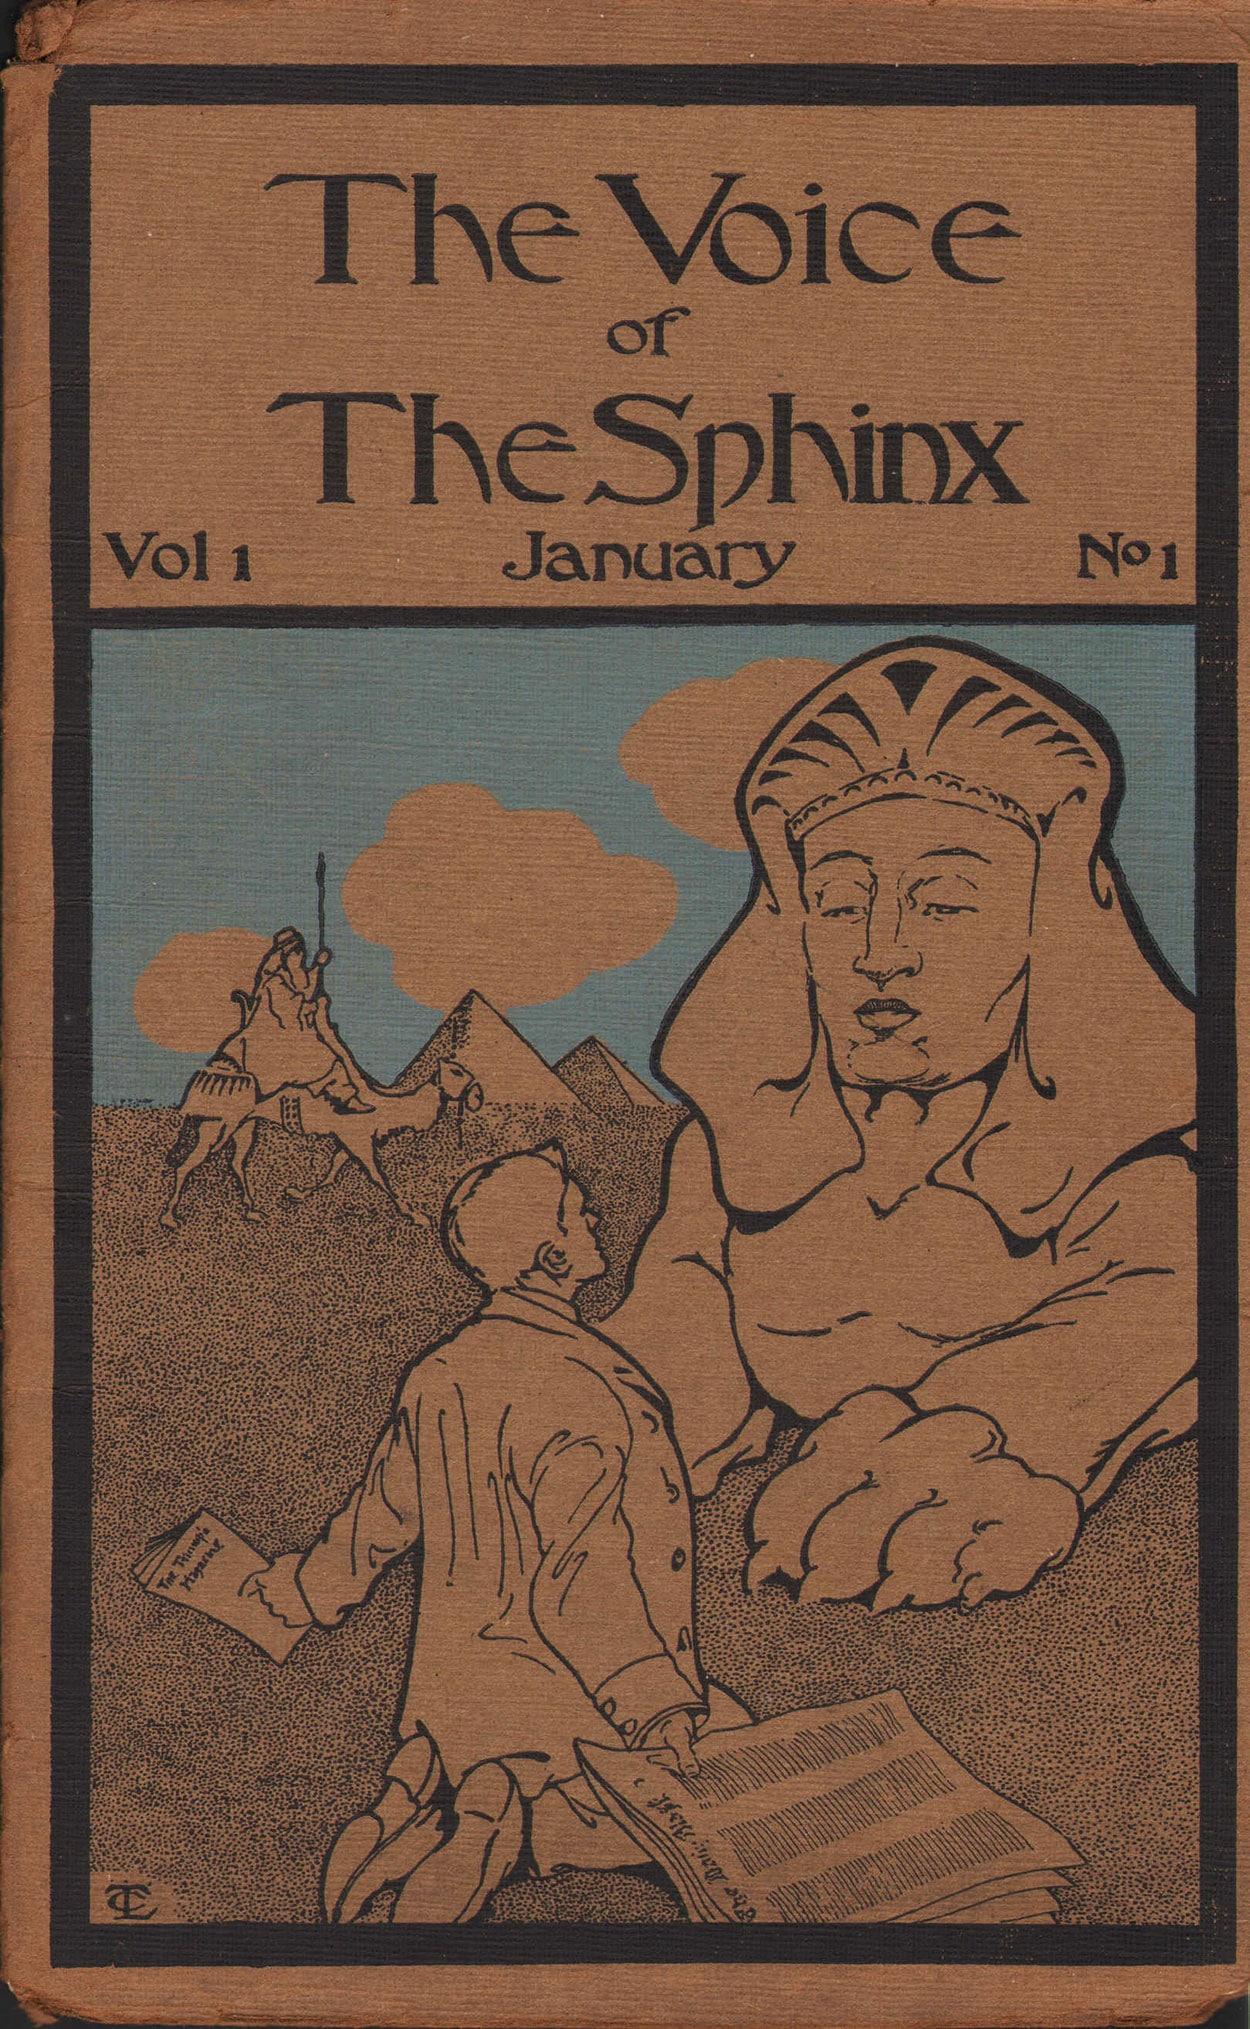 Voice of the Sphinx